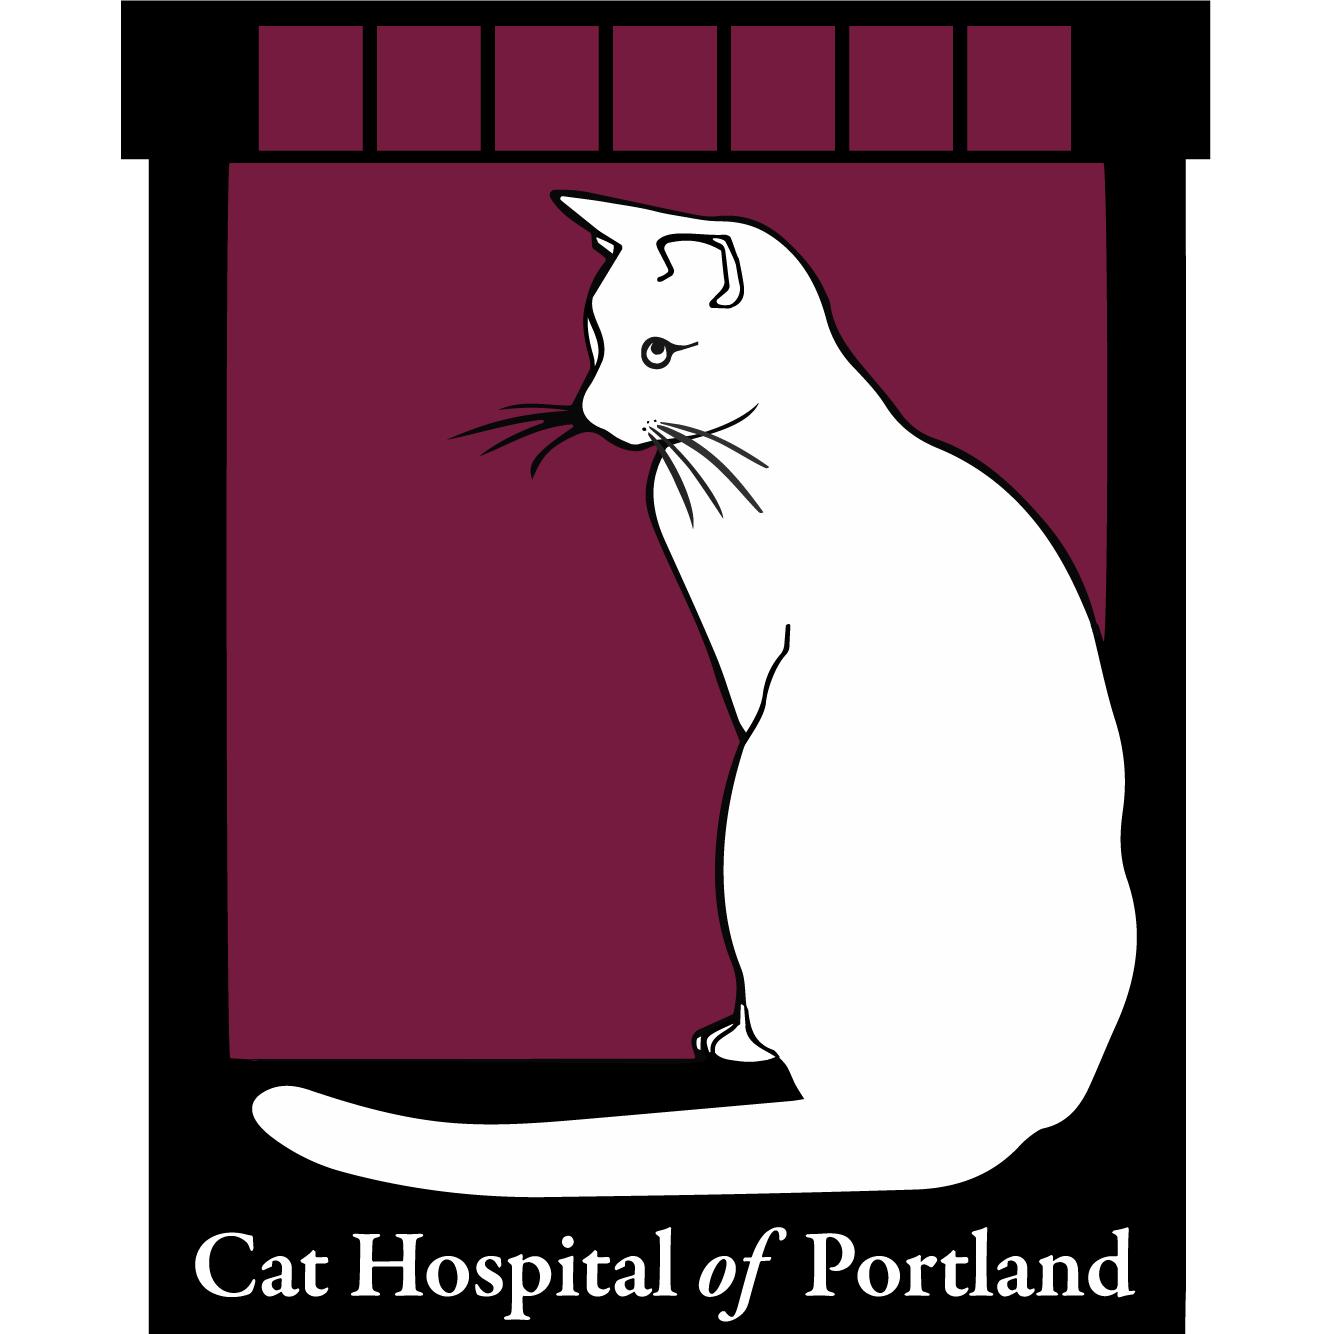 Cat Hospital of Portland